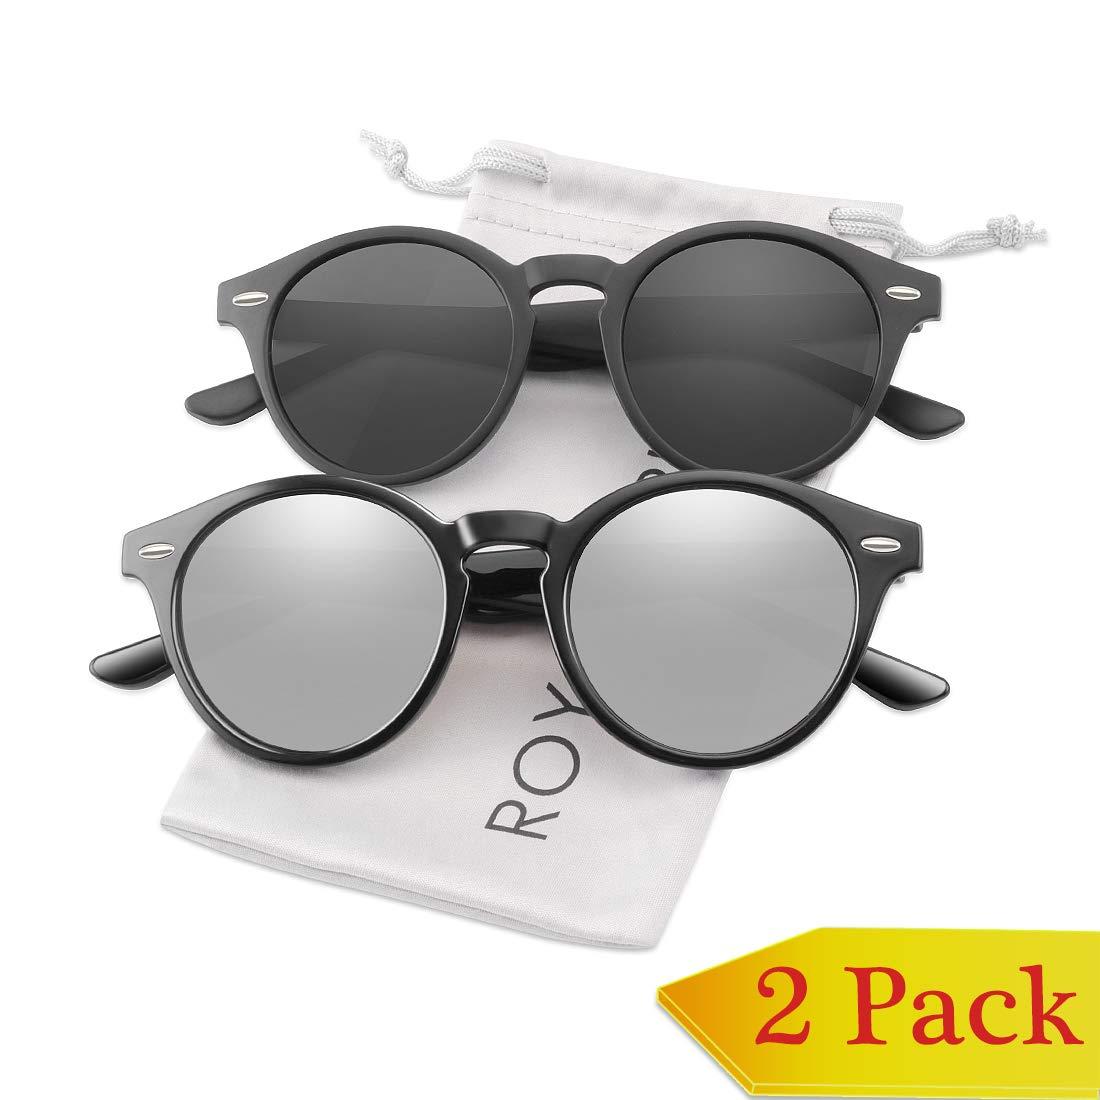 2 Pack Black Lens + Silver Mirrored Lens ROYAL GIRL Classic Round Retro Sunglasses For Women polarized Vintage Designer Style